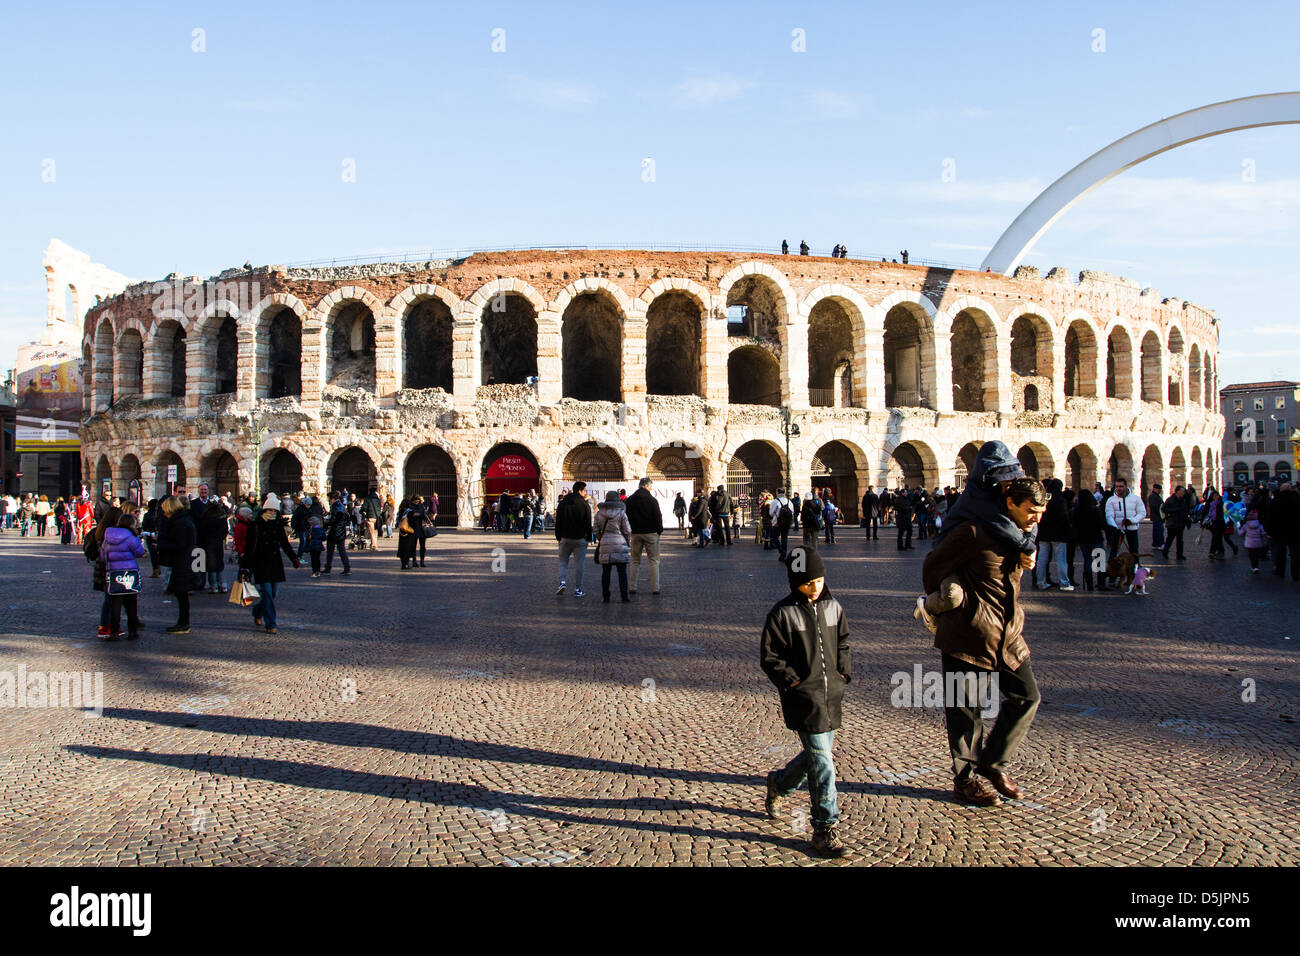 Arena di Verona (Verona Arena). - Stock Image